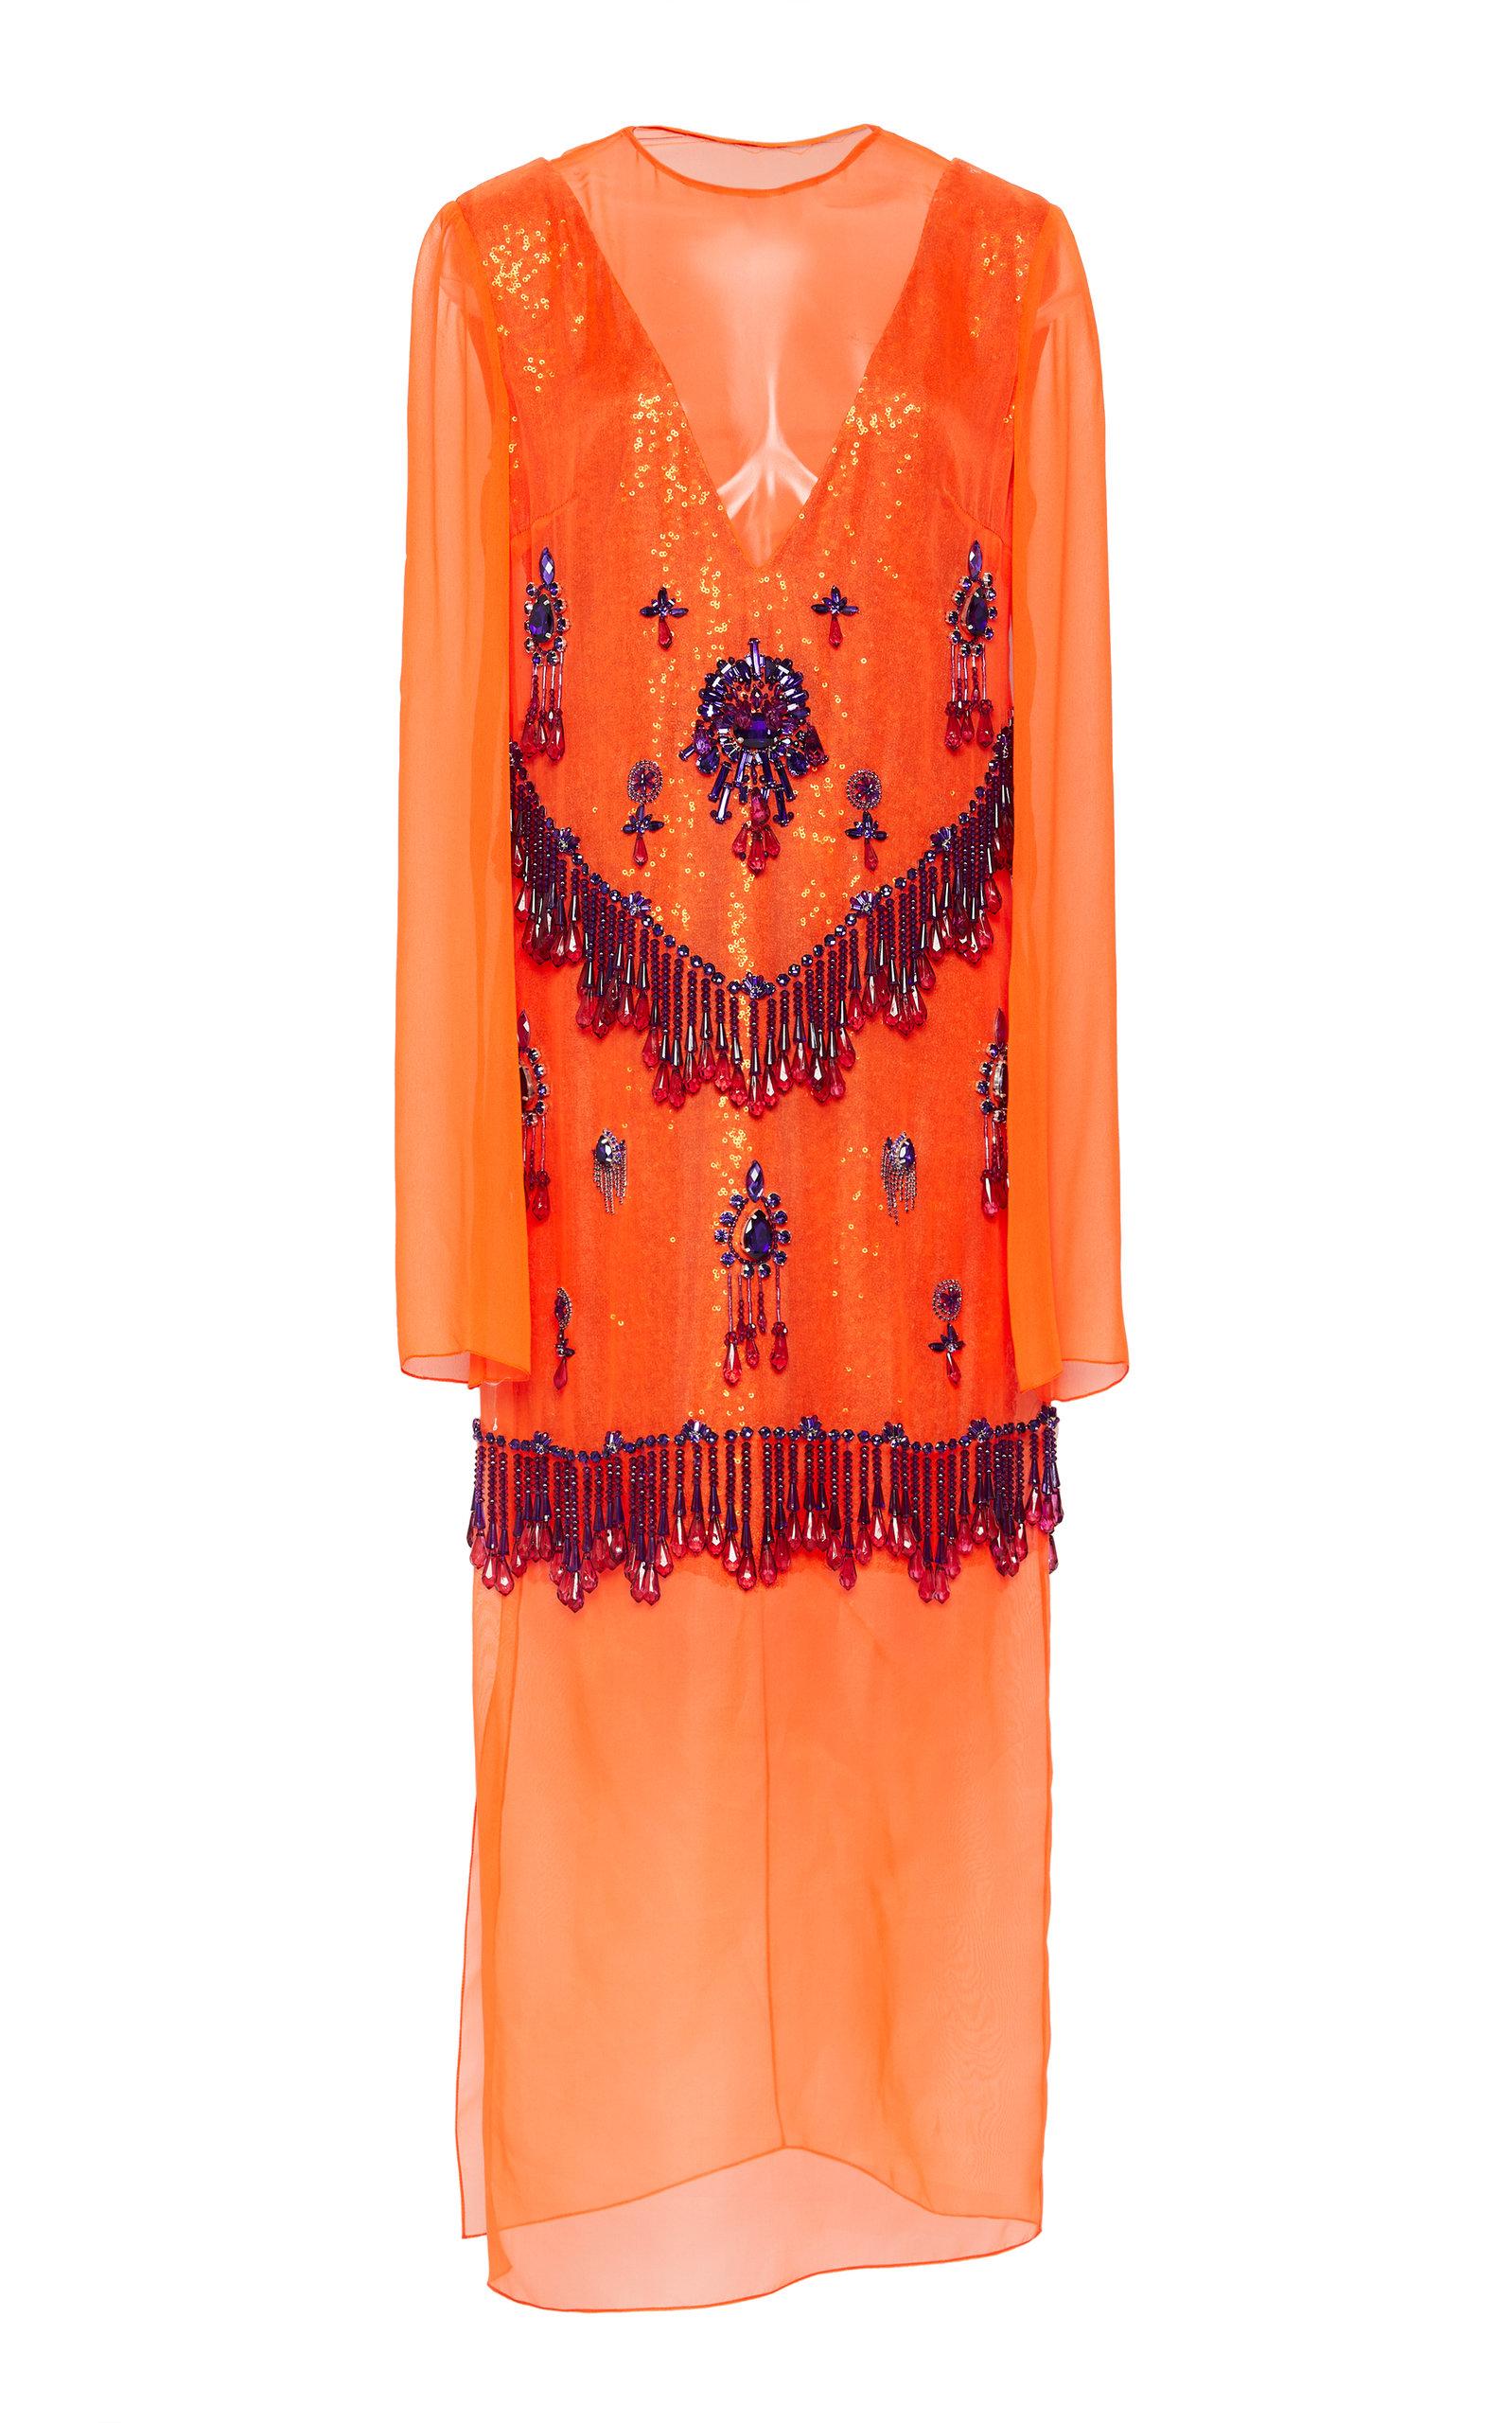 99a5292d21 Tunisian Dress Holi – Fashion dresses